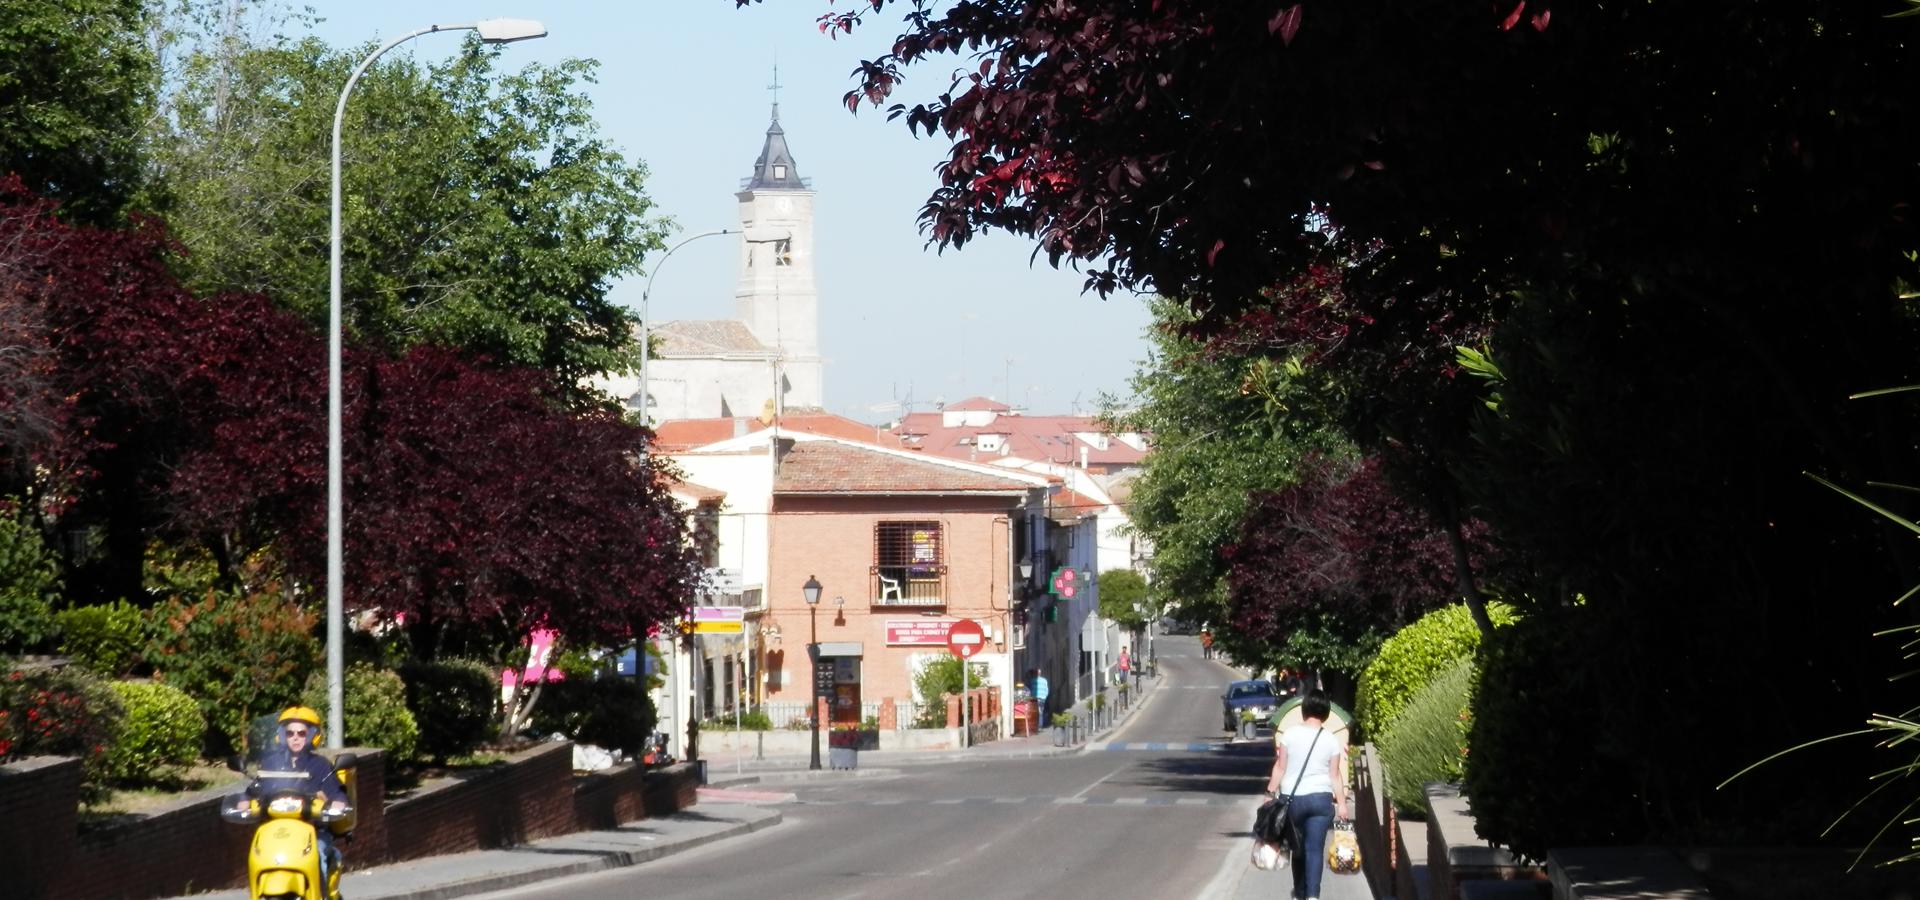 Peer-to-peer advisory in Toledo, Province of Toledo, Castilla-La Mancha, Spain